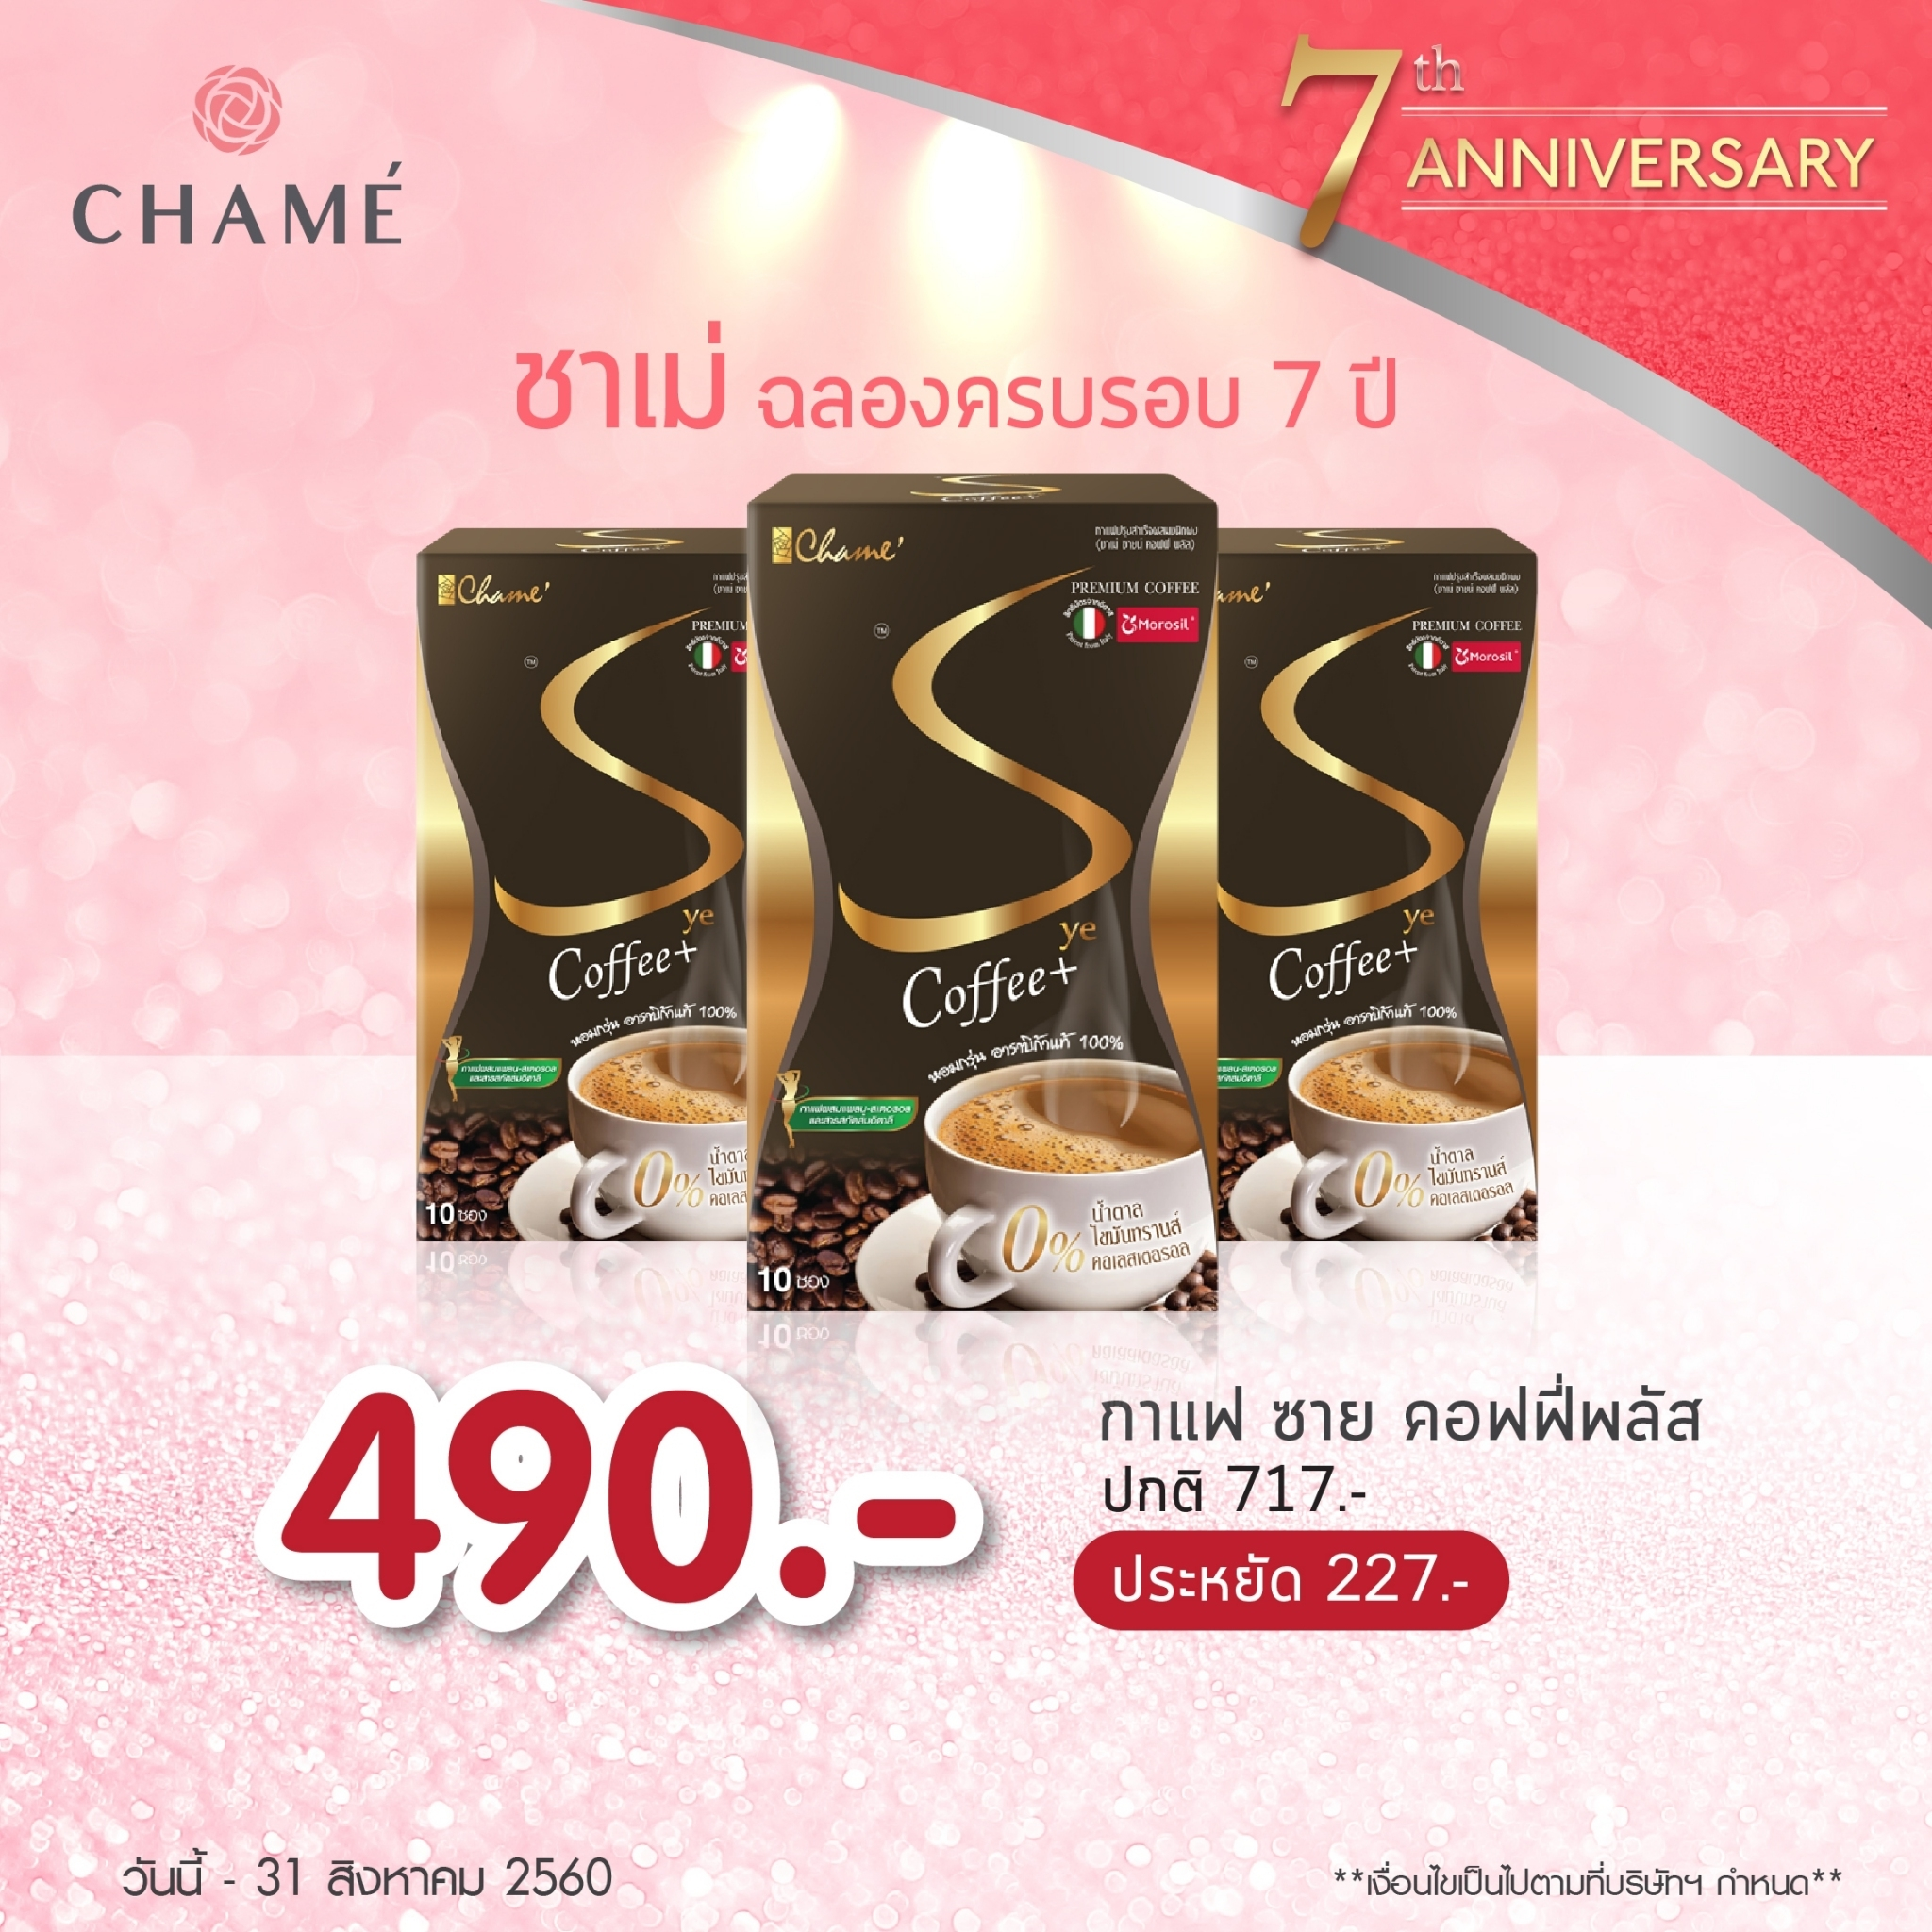 Sye Coffee Plus จำนวน 3 กล่อง กาแฟลดน้ำหนักสารสกัดโมโรซิลสิทธิบัตรเดียวในประเทศไทย